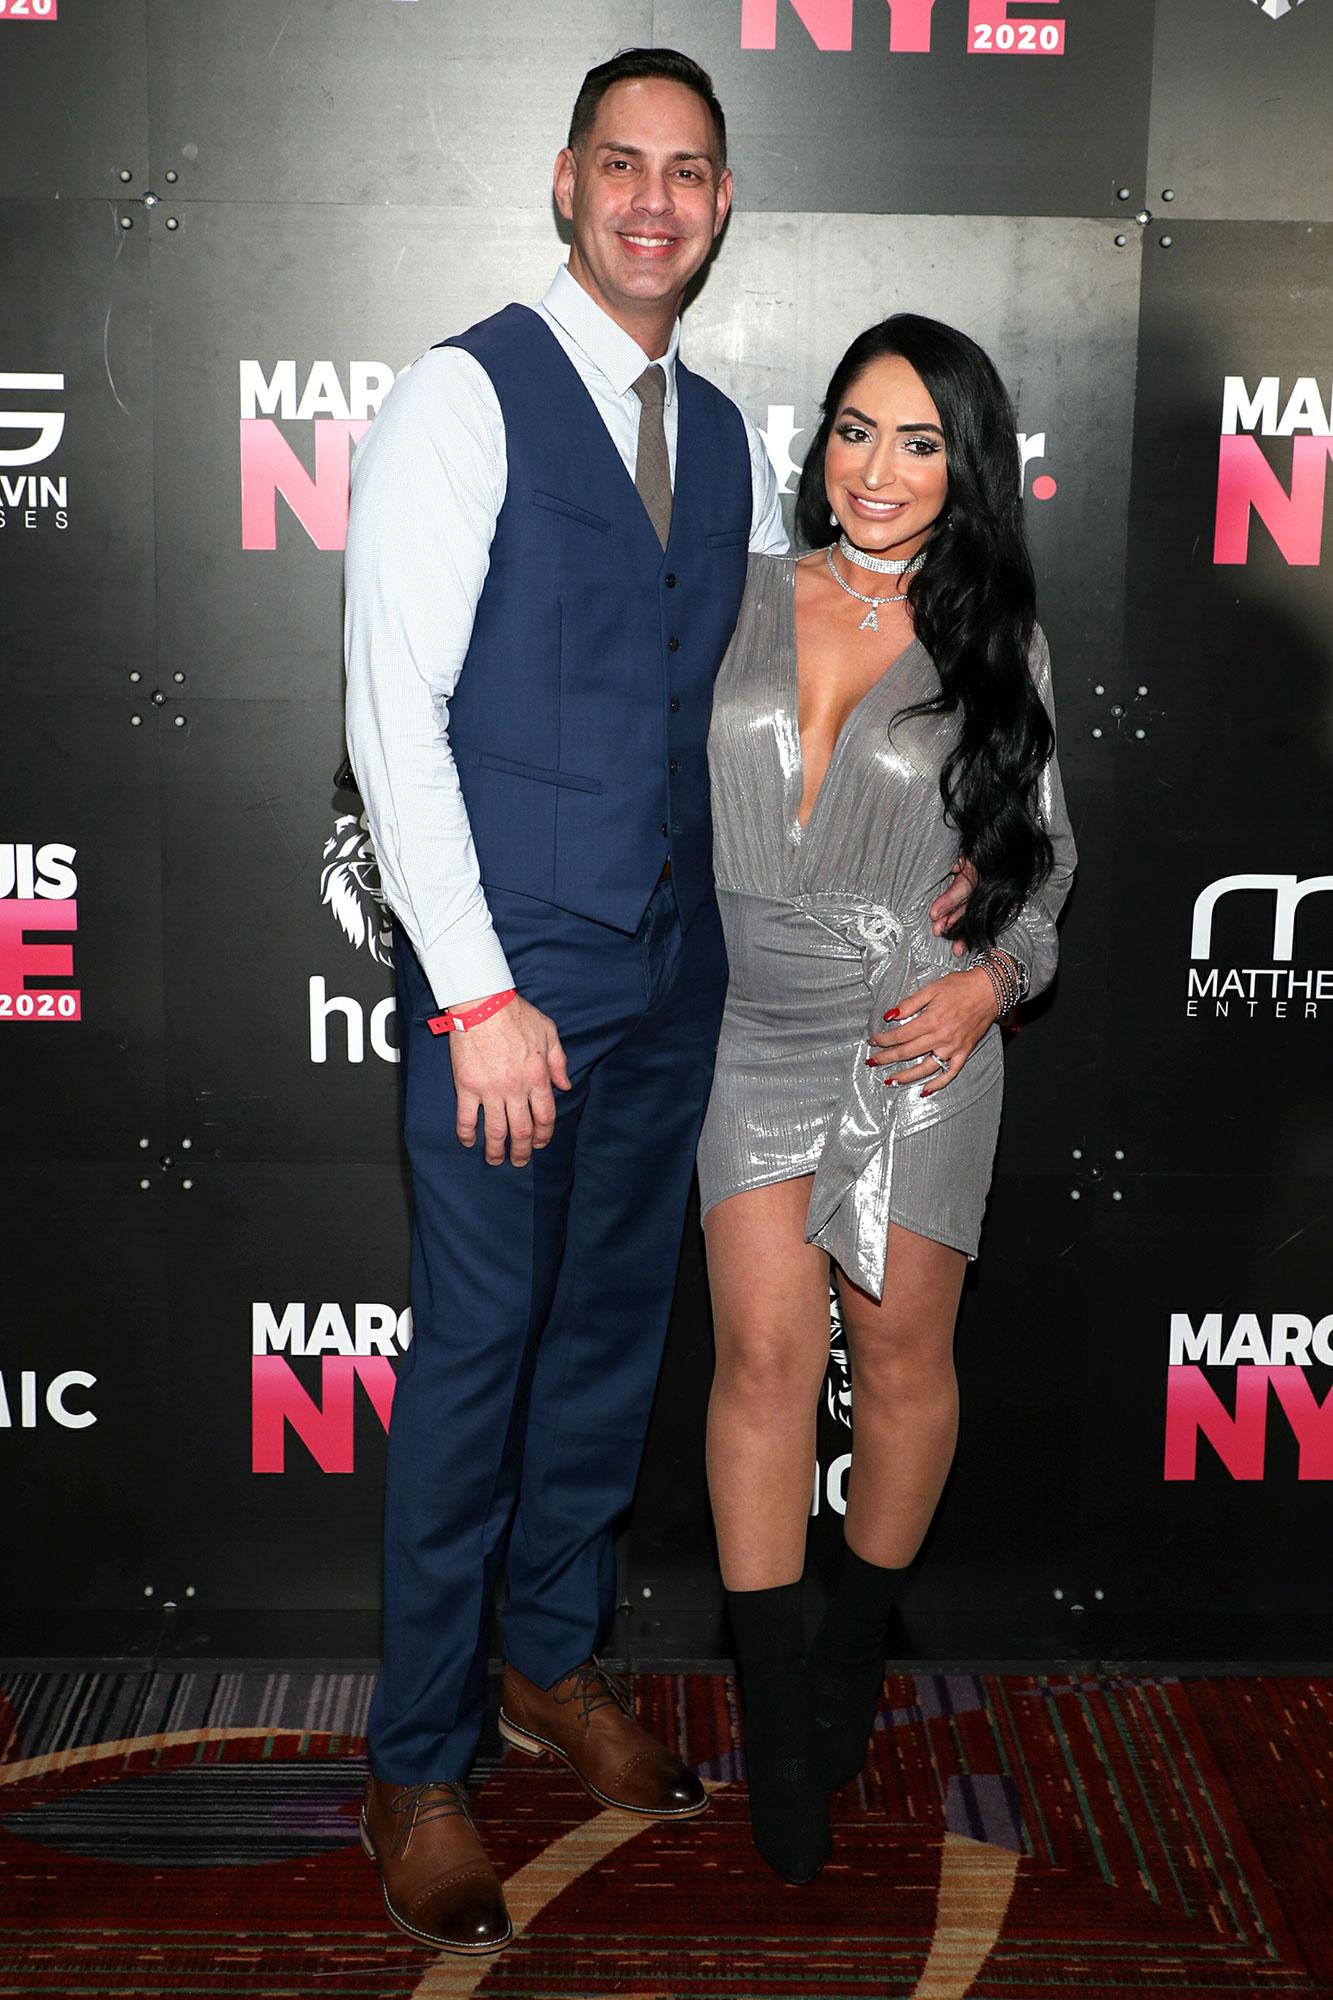 Jersey Shore's Angelina Pivarnick and Husband Chris' Ups and Downs